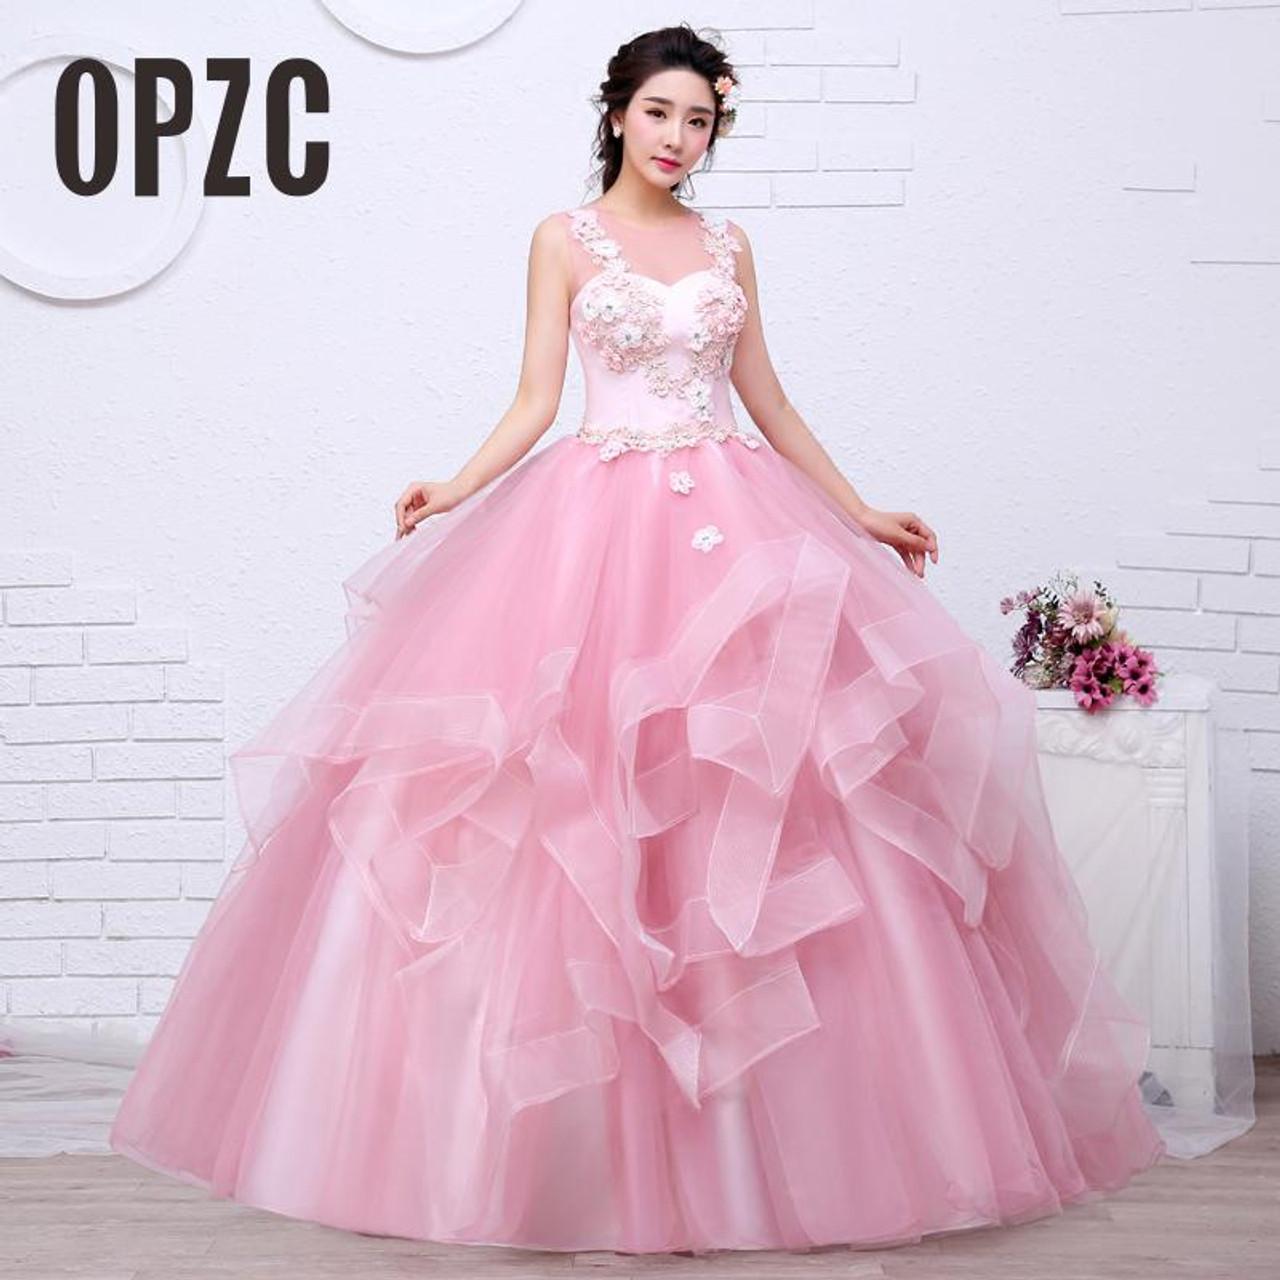 Free shippin Pink Color Yarn Girls Wedding dress 2017 New Fashion Simple Female  Art Exam Gowns Part Dress Vestidos De Novia - OnshopDeals.Com 5eb712f55d4b